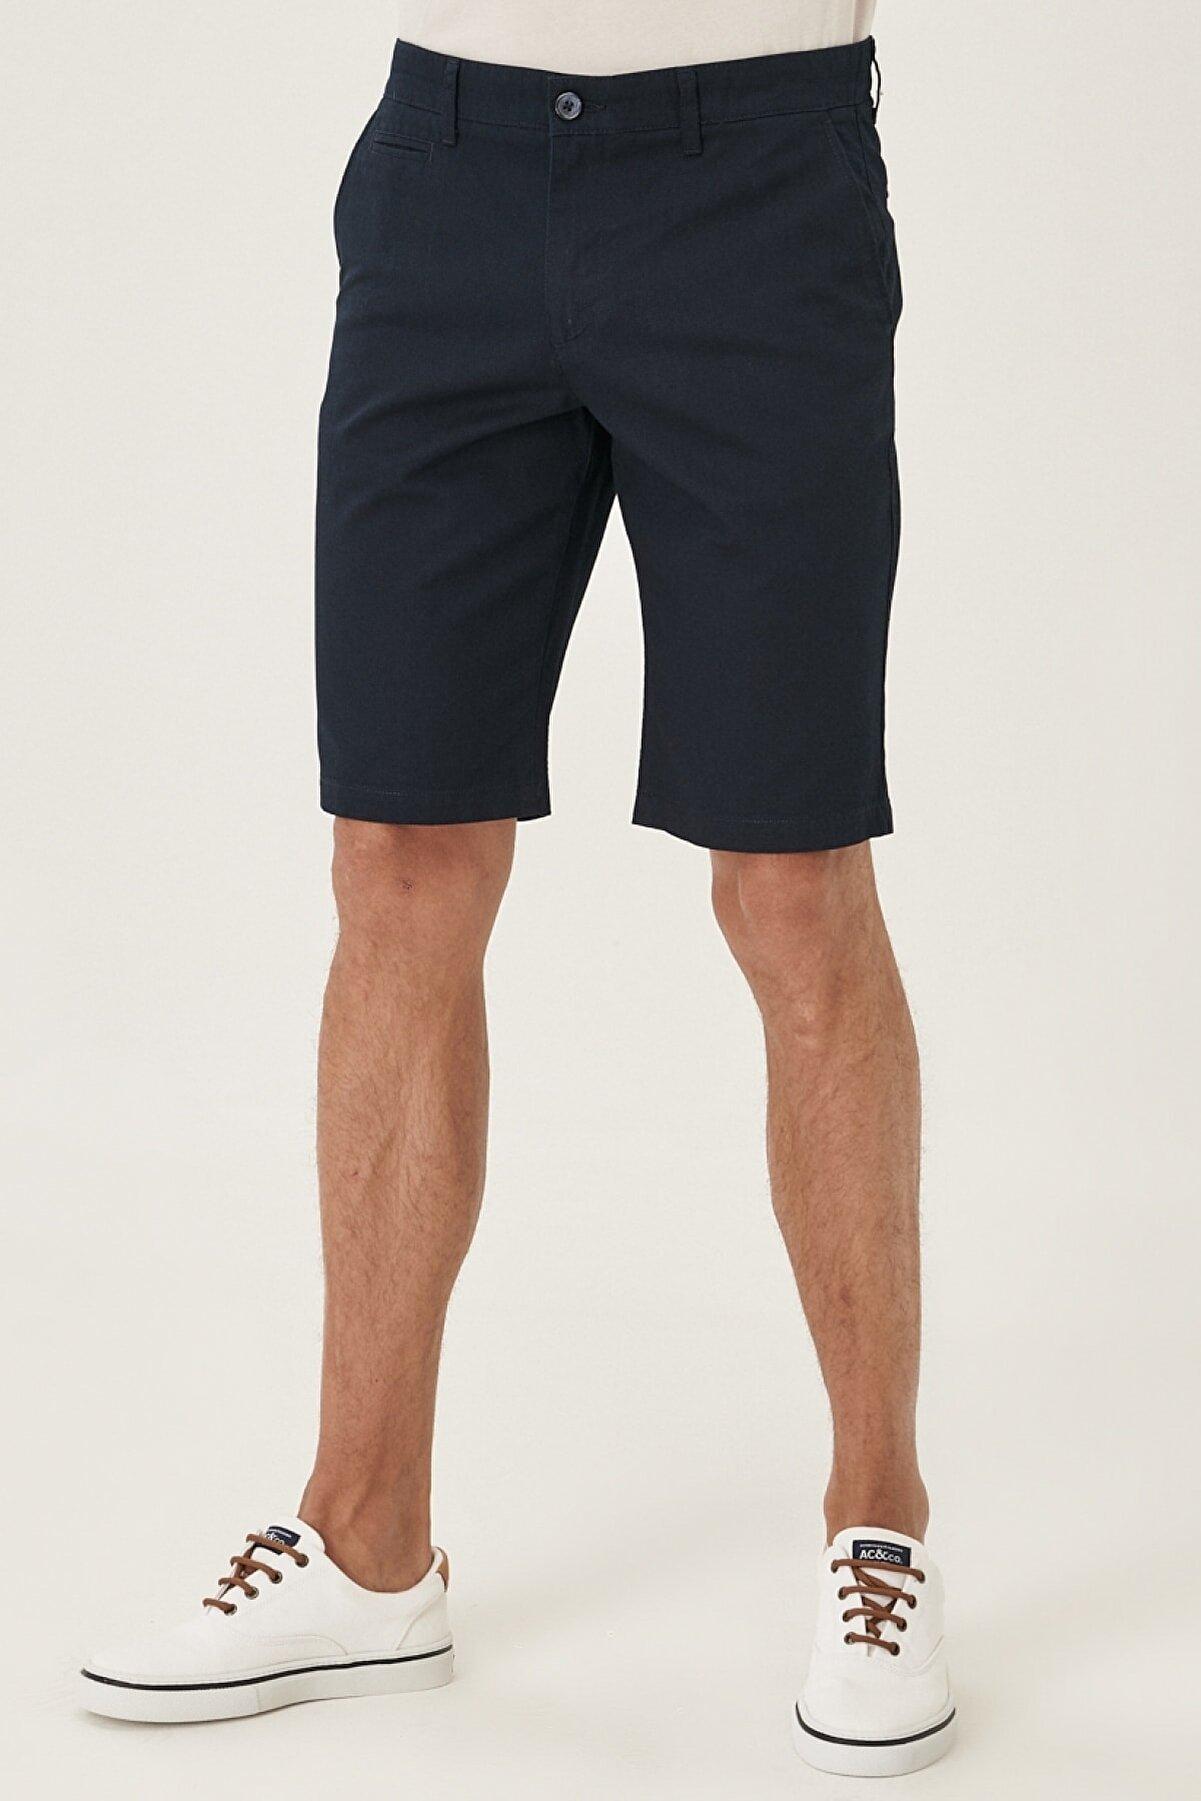 Altınyıldız Classics Erkek Lacivert Slim Fit Casual %100 Koton Chino Bermuda Şort